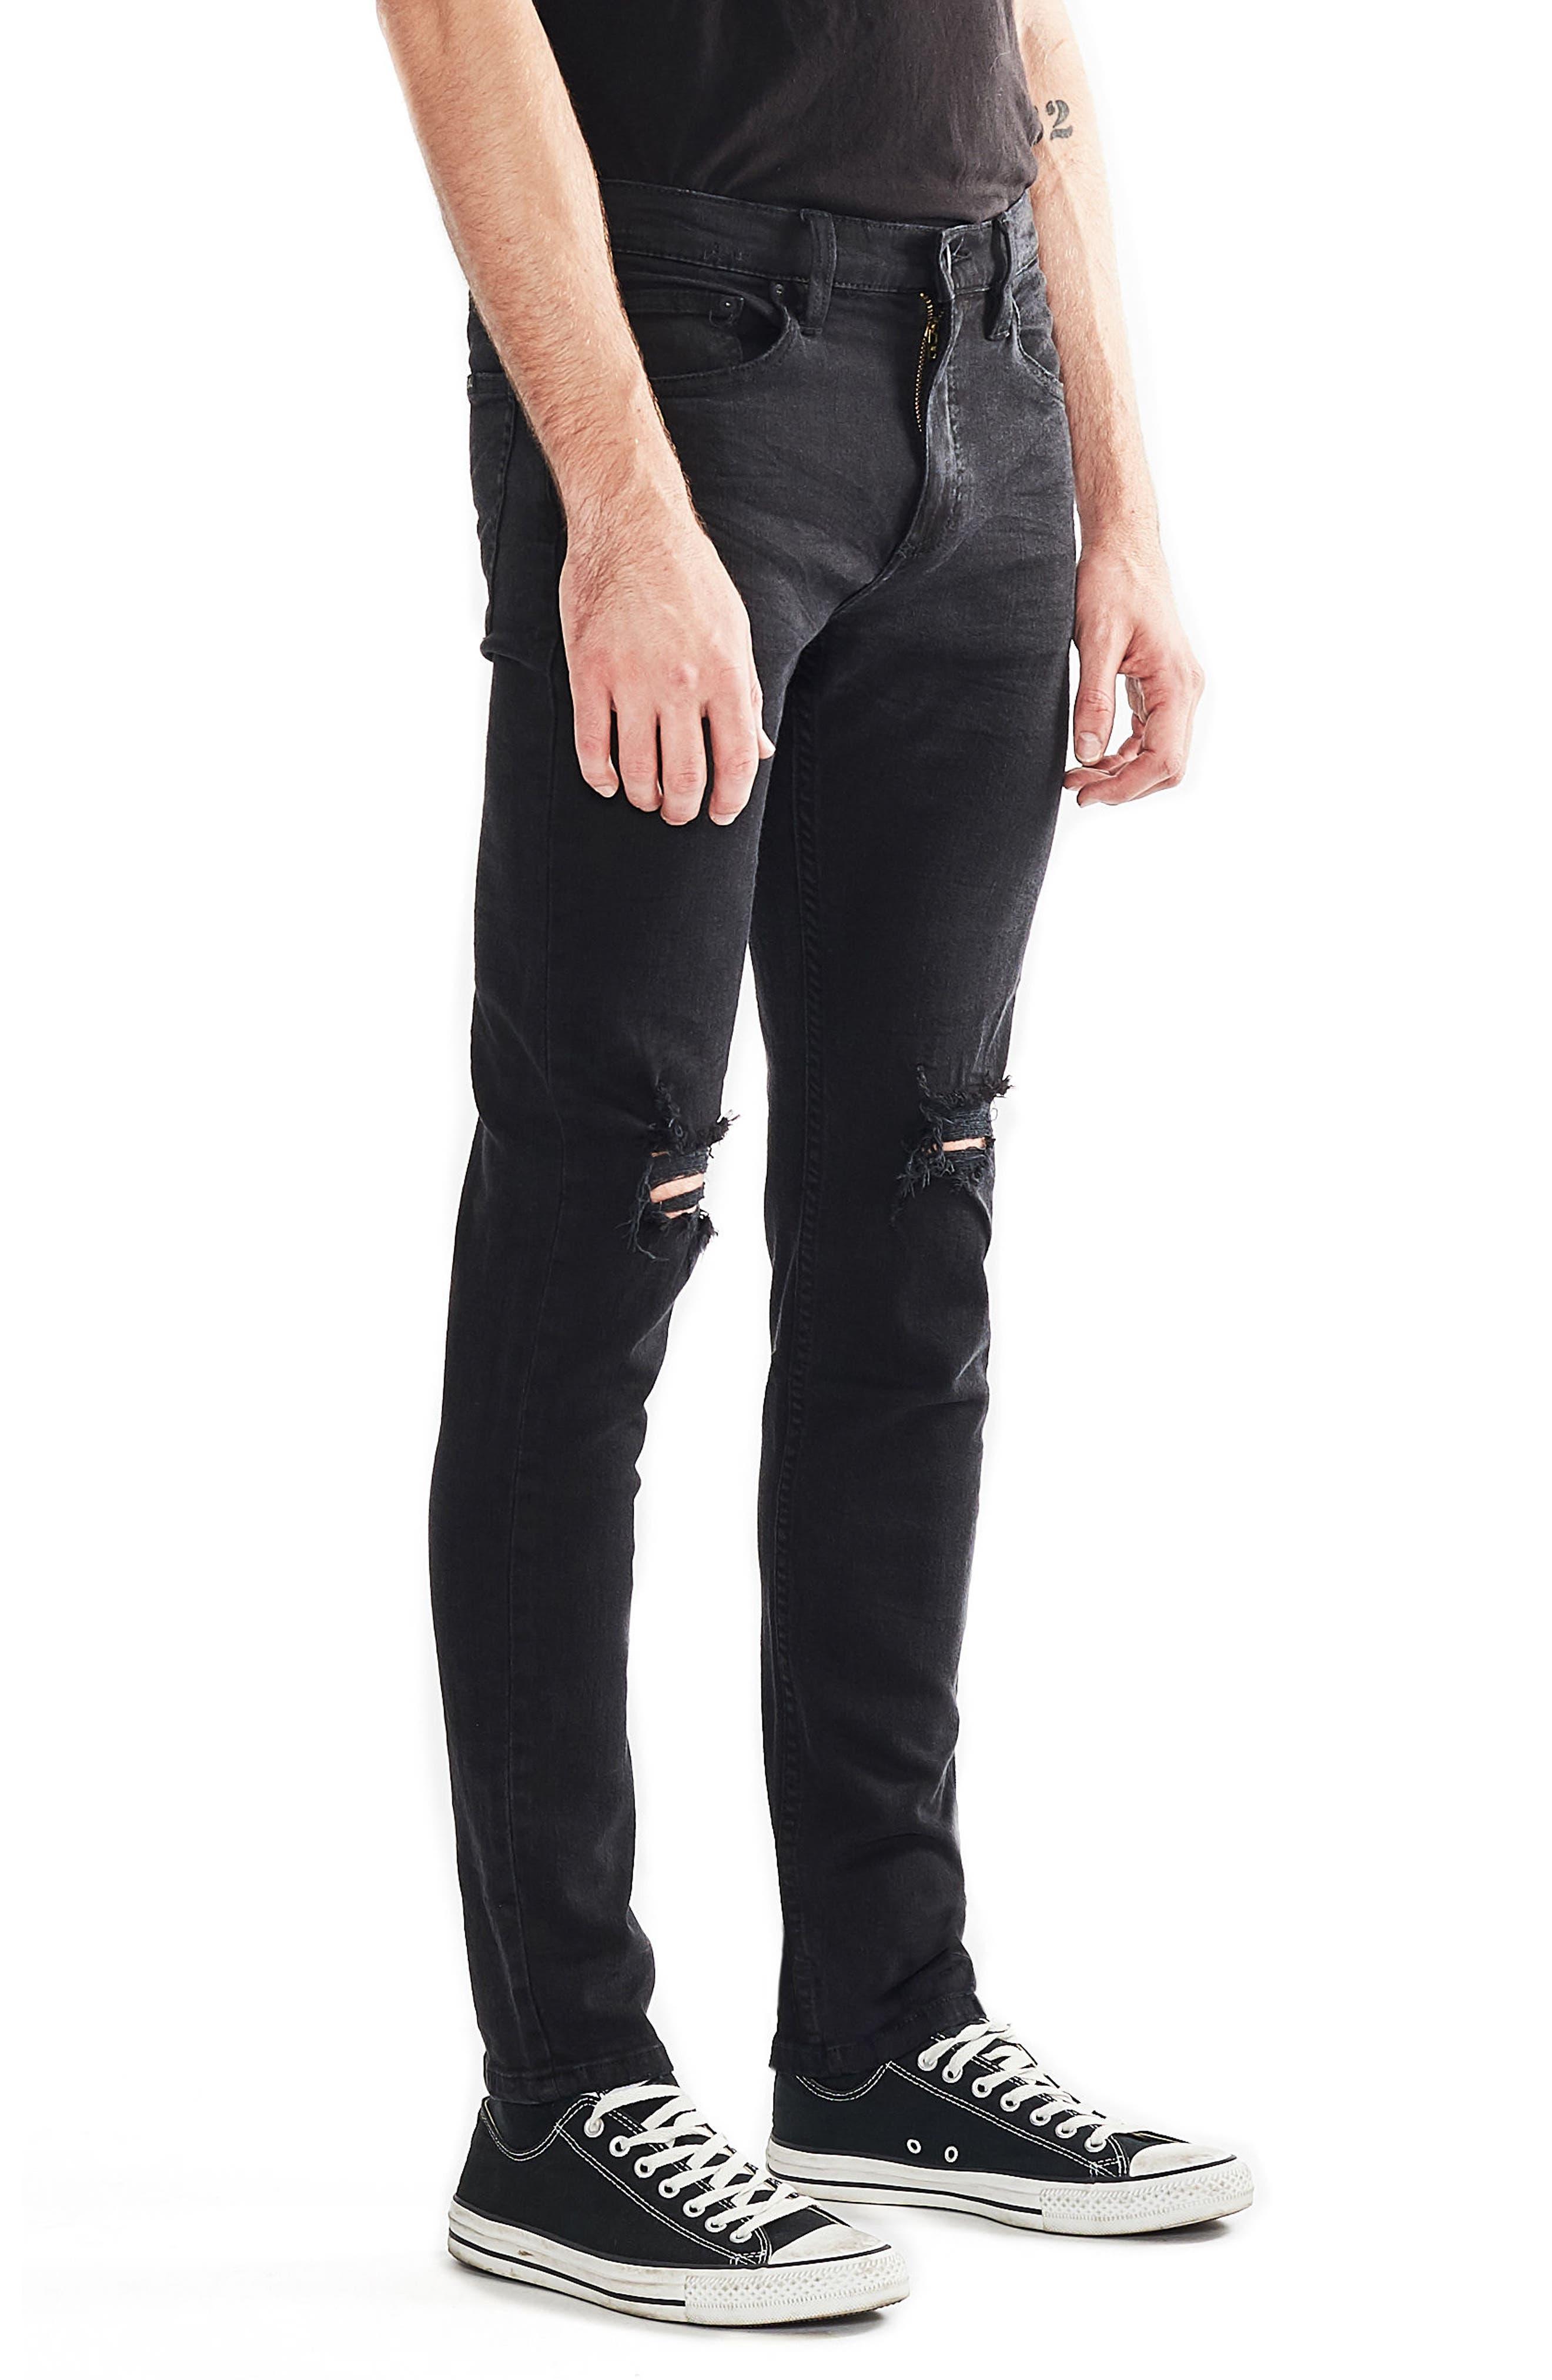 Stinger Skinny Fit Jeans,                             Alternate thumbnail 3, color,                             Black Hole